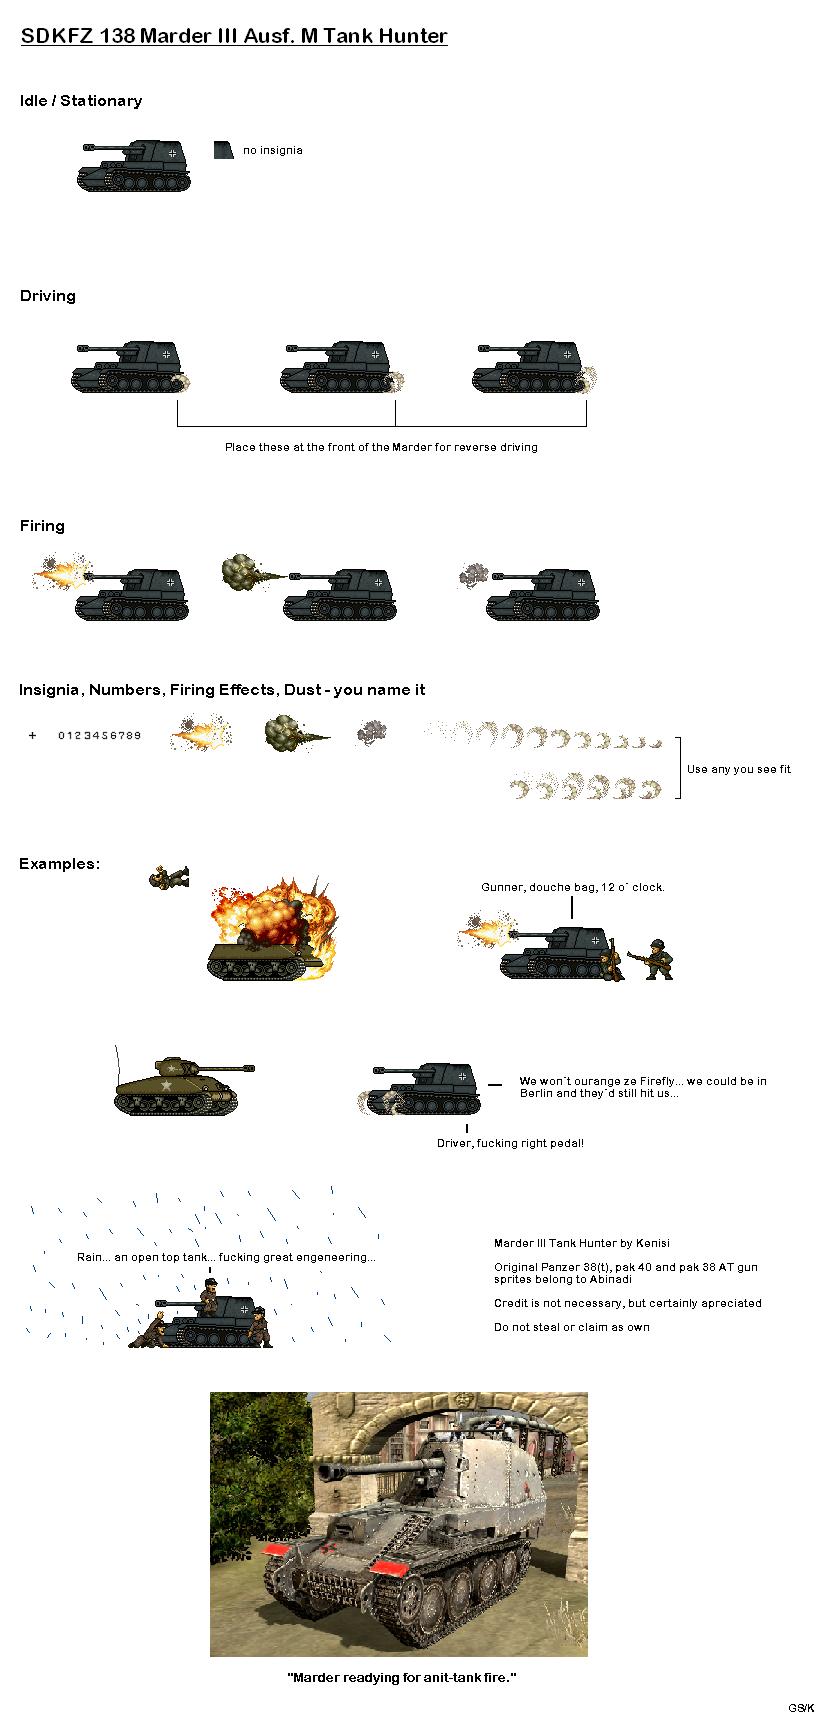 Marder Iii Tank Hunter Marder Iii Tank Hunter by